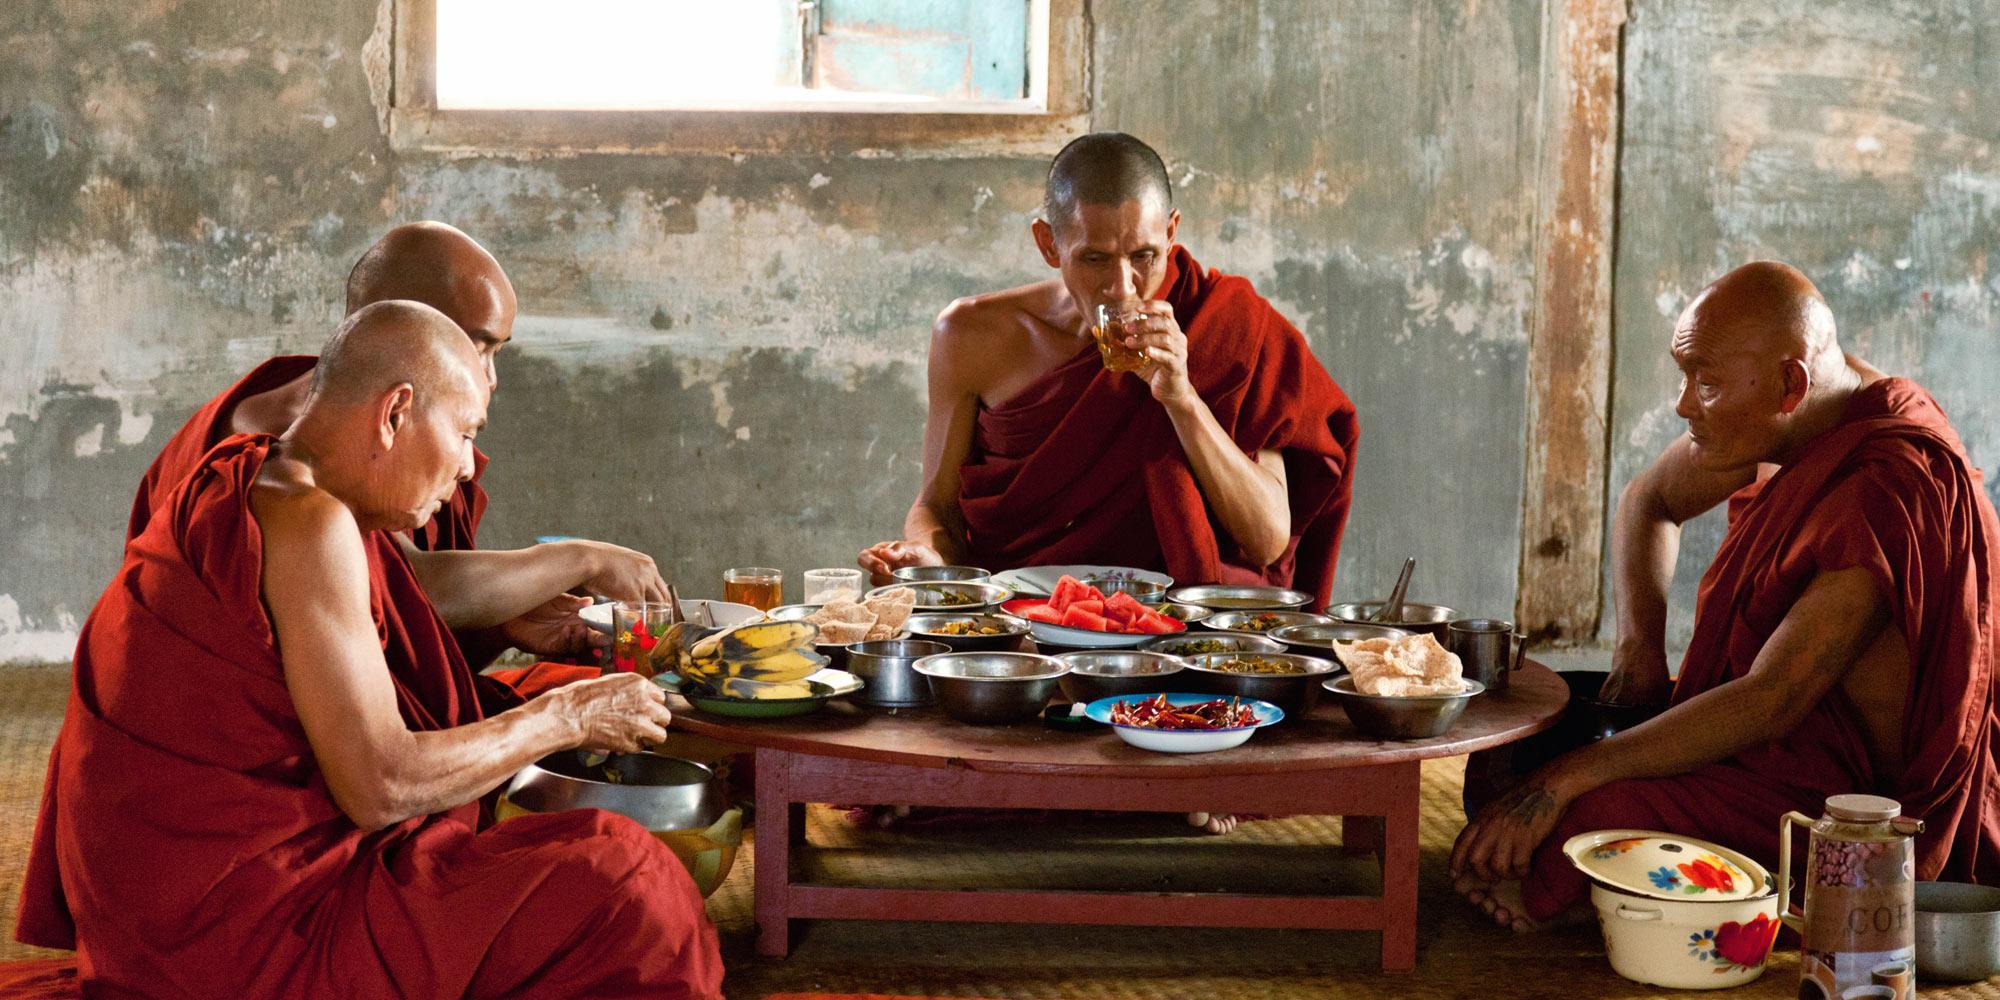 Bhutan tour package online